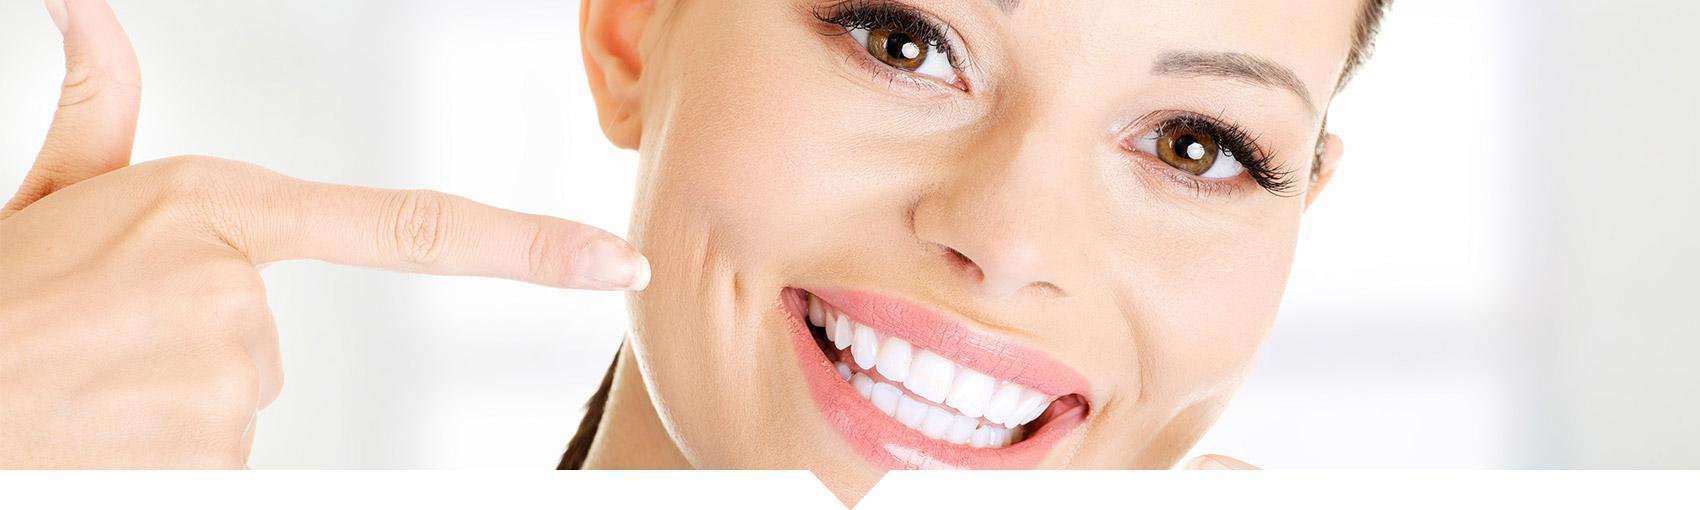 Dental Crowns and Cerec, CA